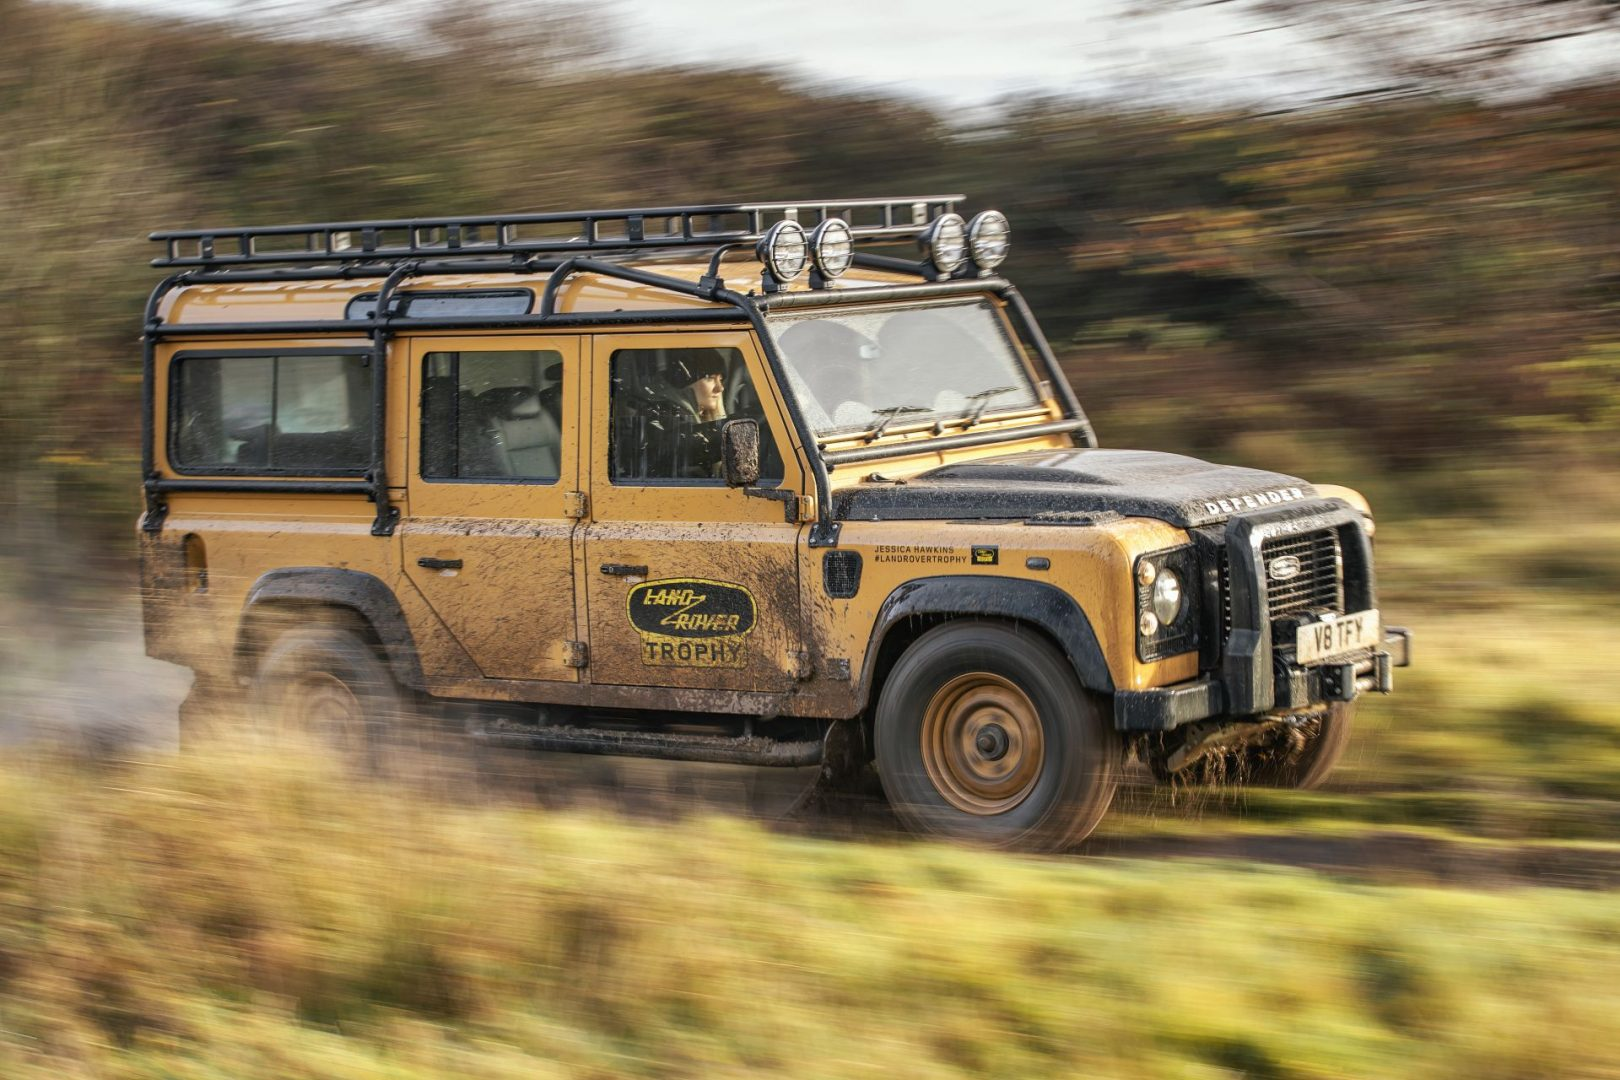 Land Rover najavljuje 25 primjeraka modela Defender Works V8 Trophy